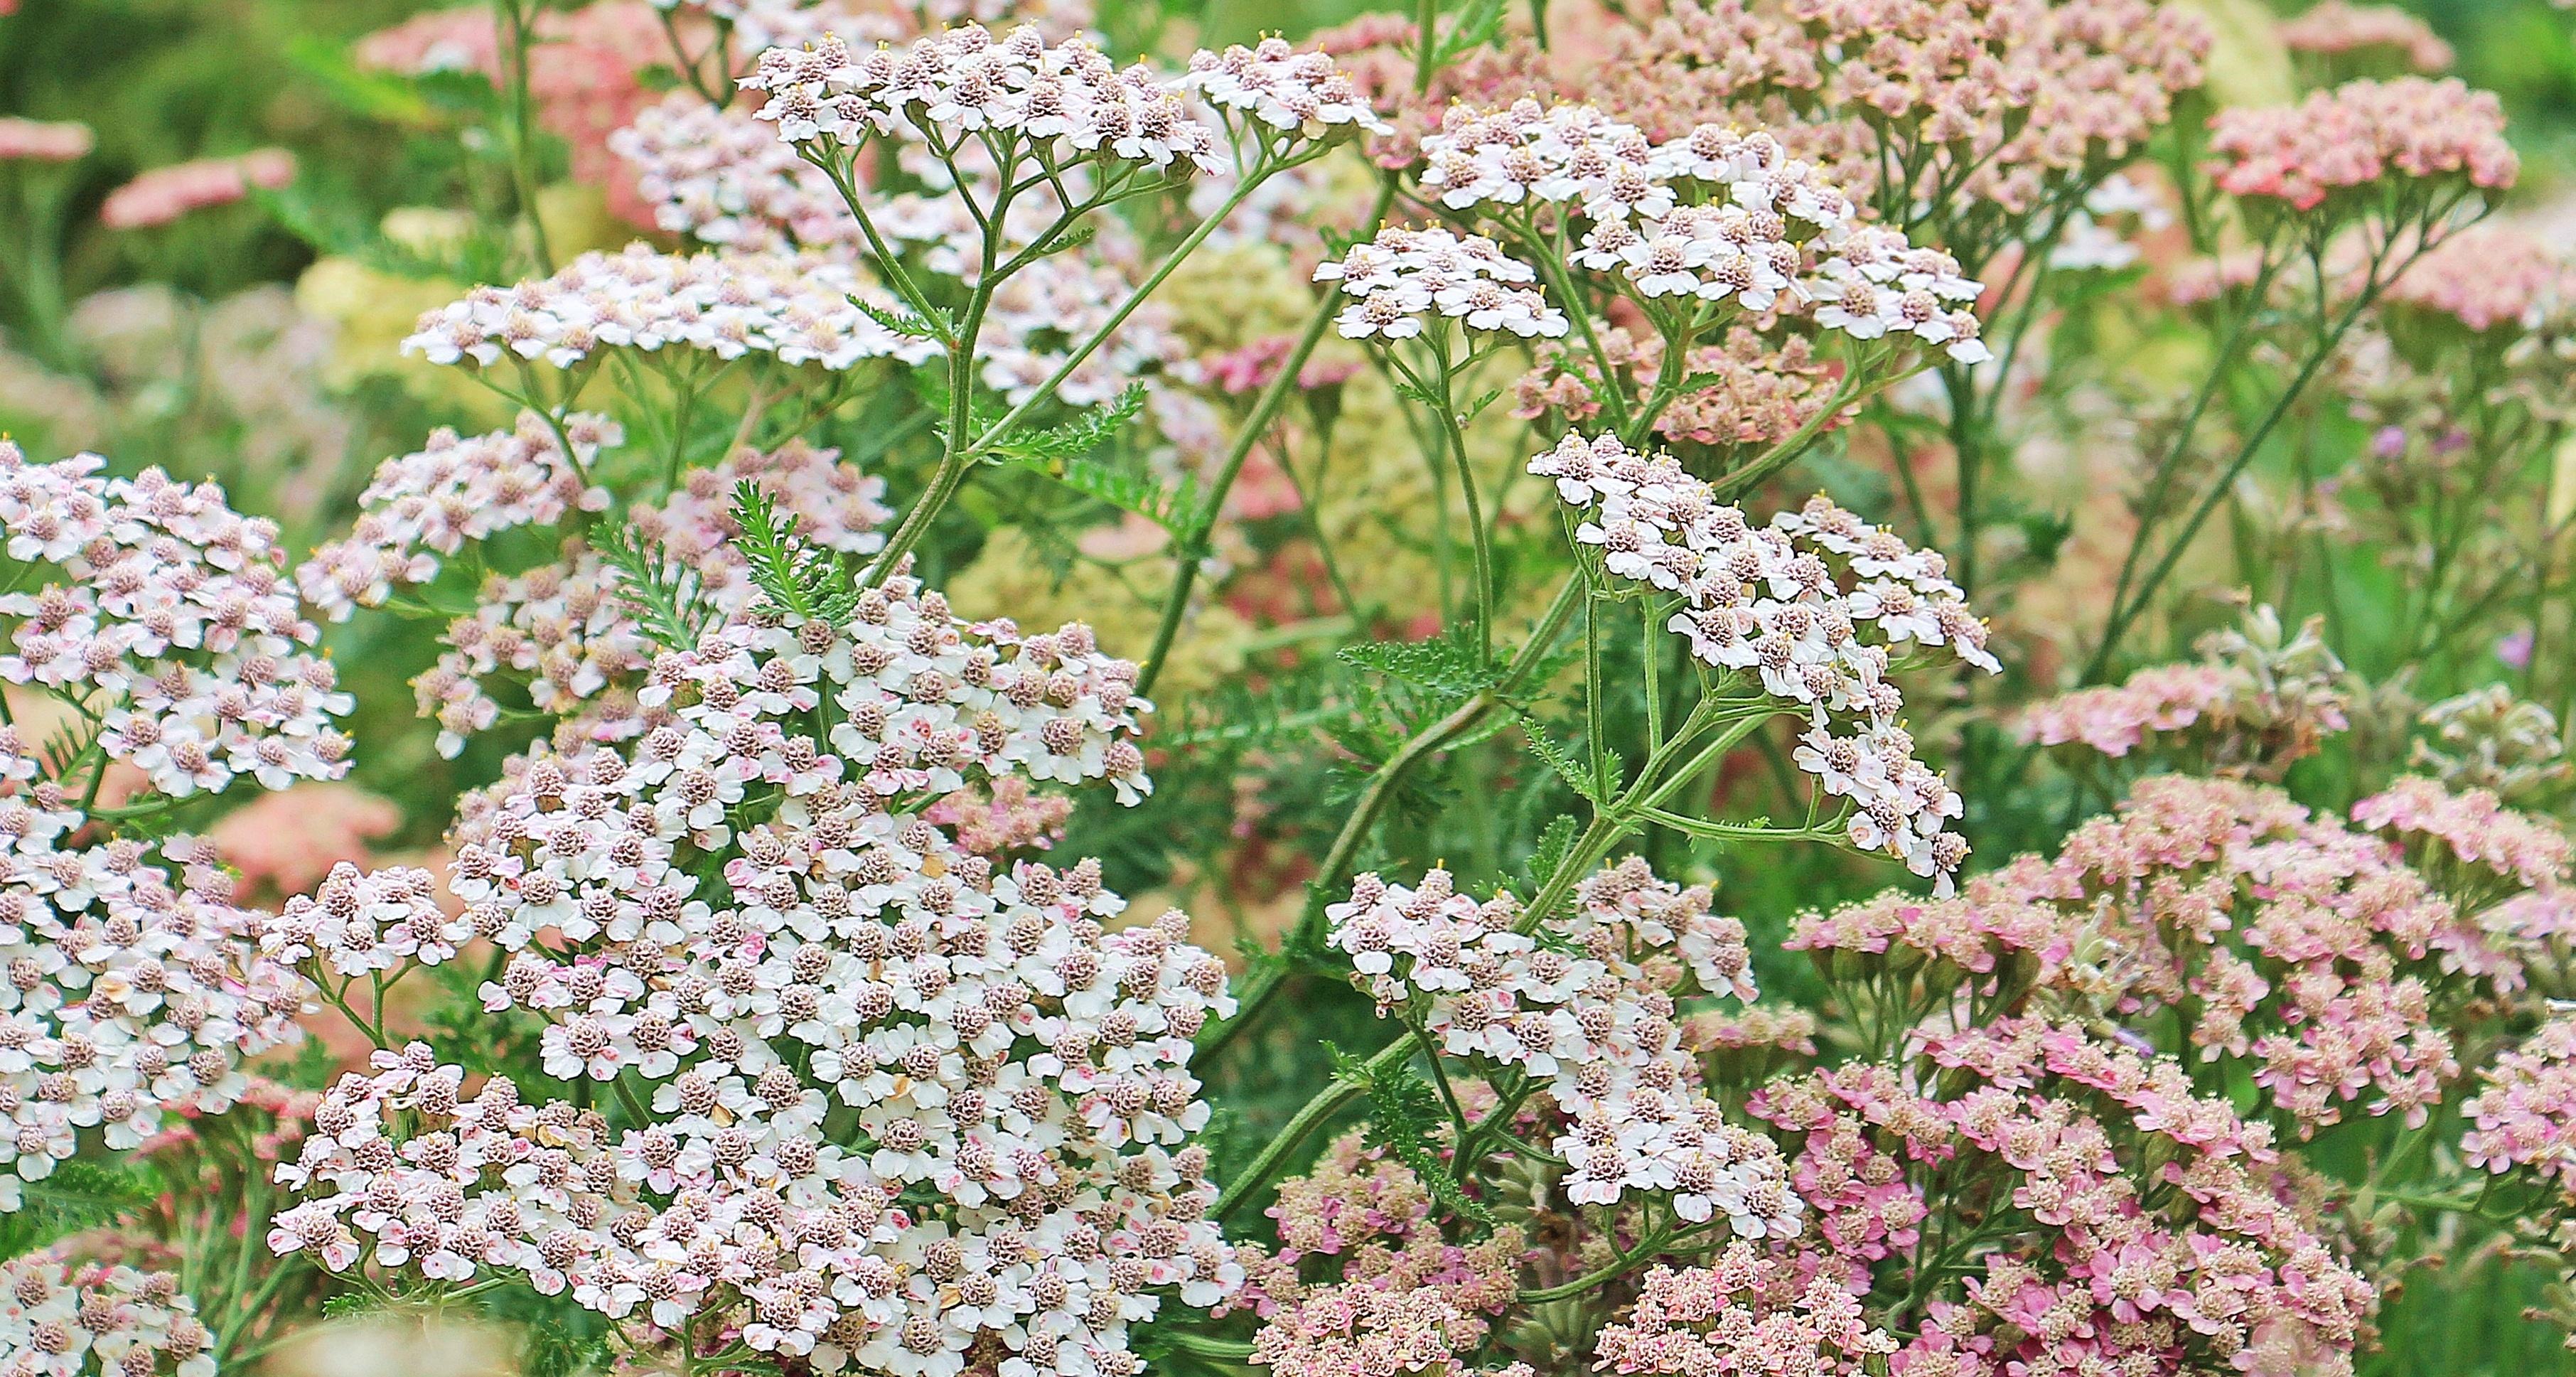 Fotos Gratis Rama Blanco Florecer Hierba Produce Botanica